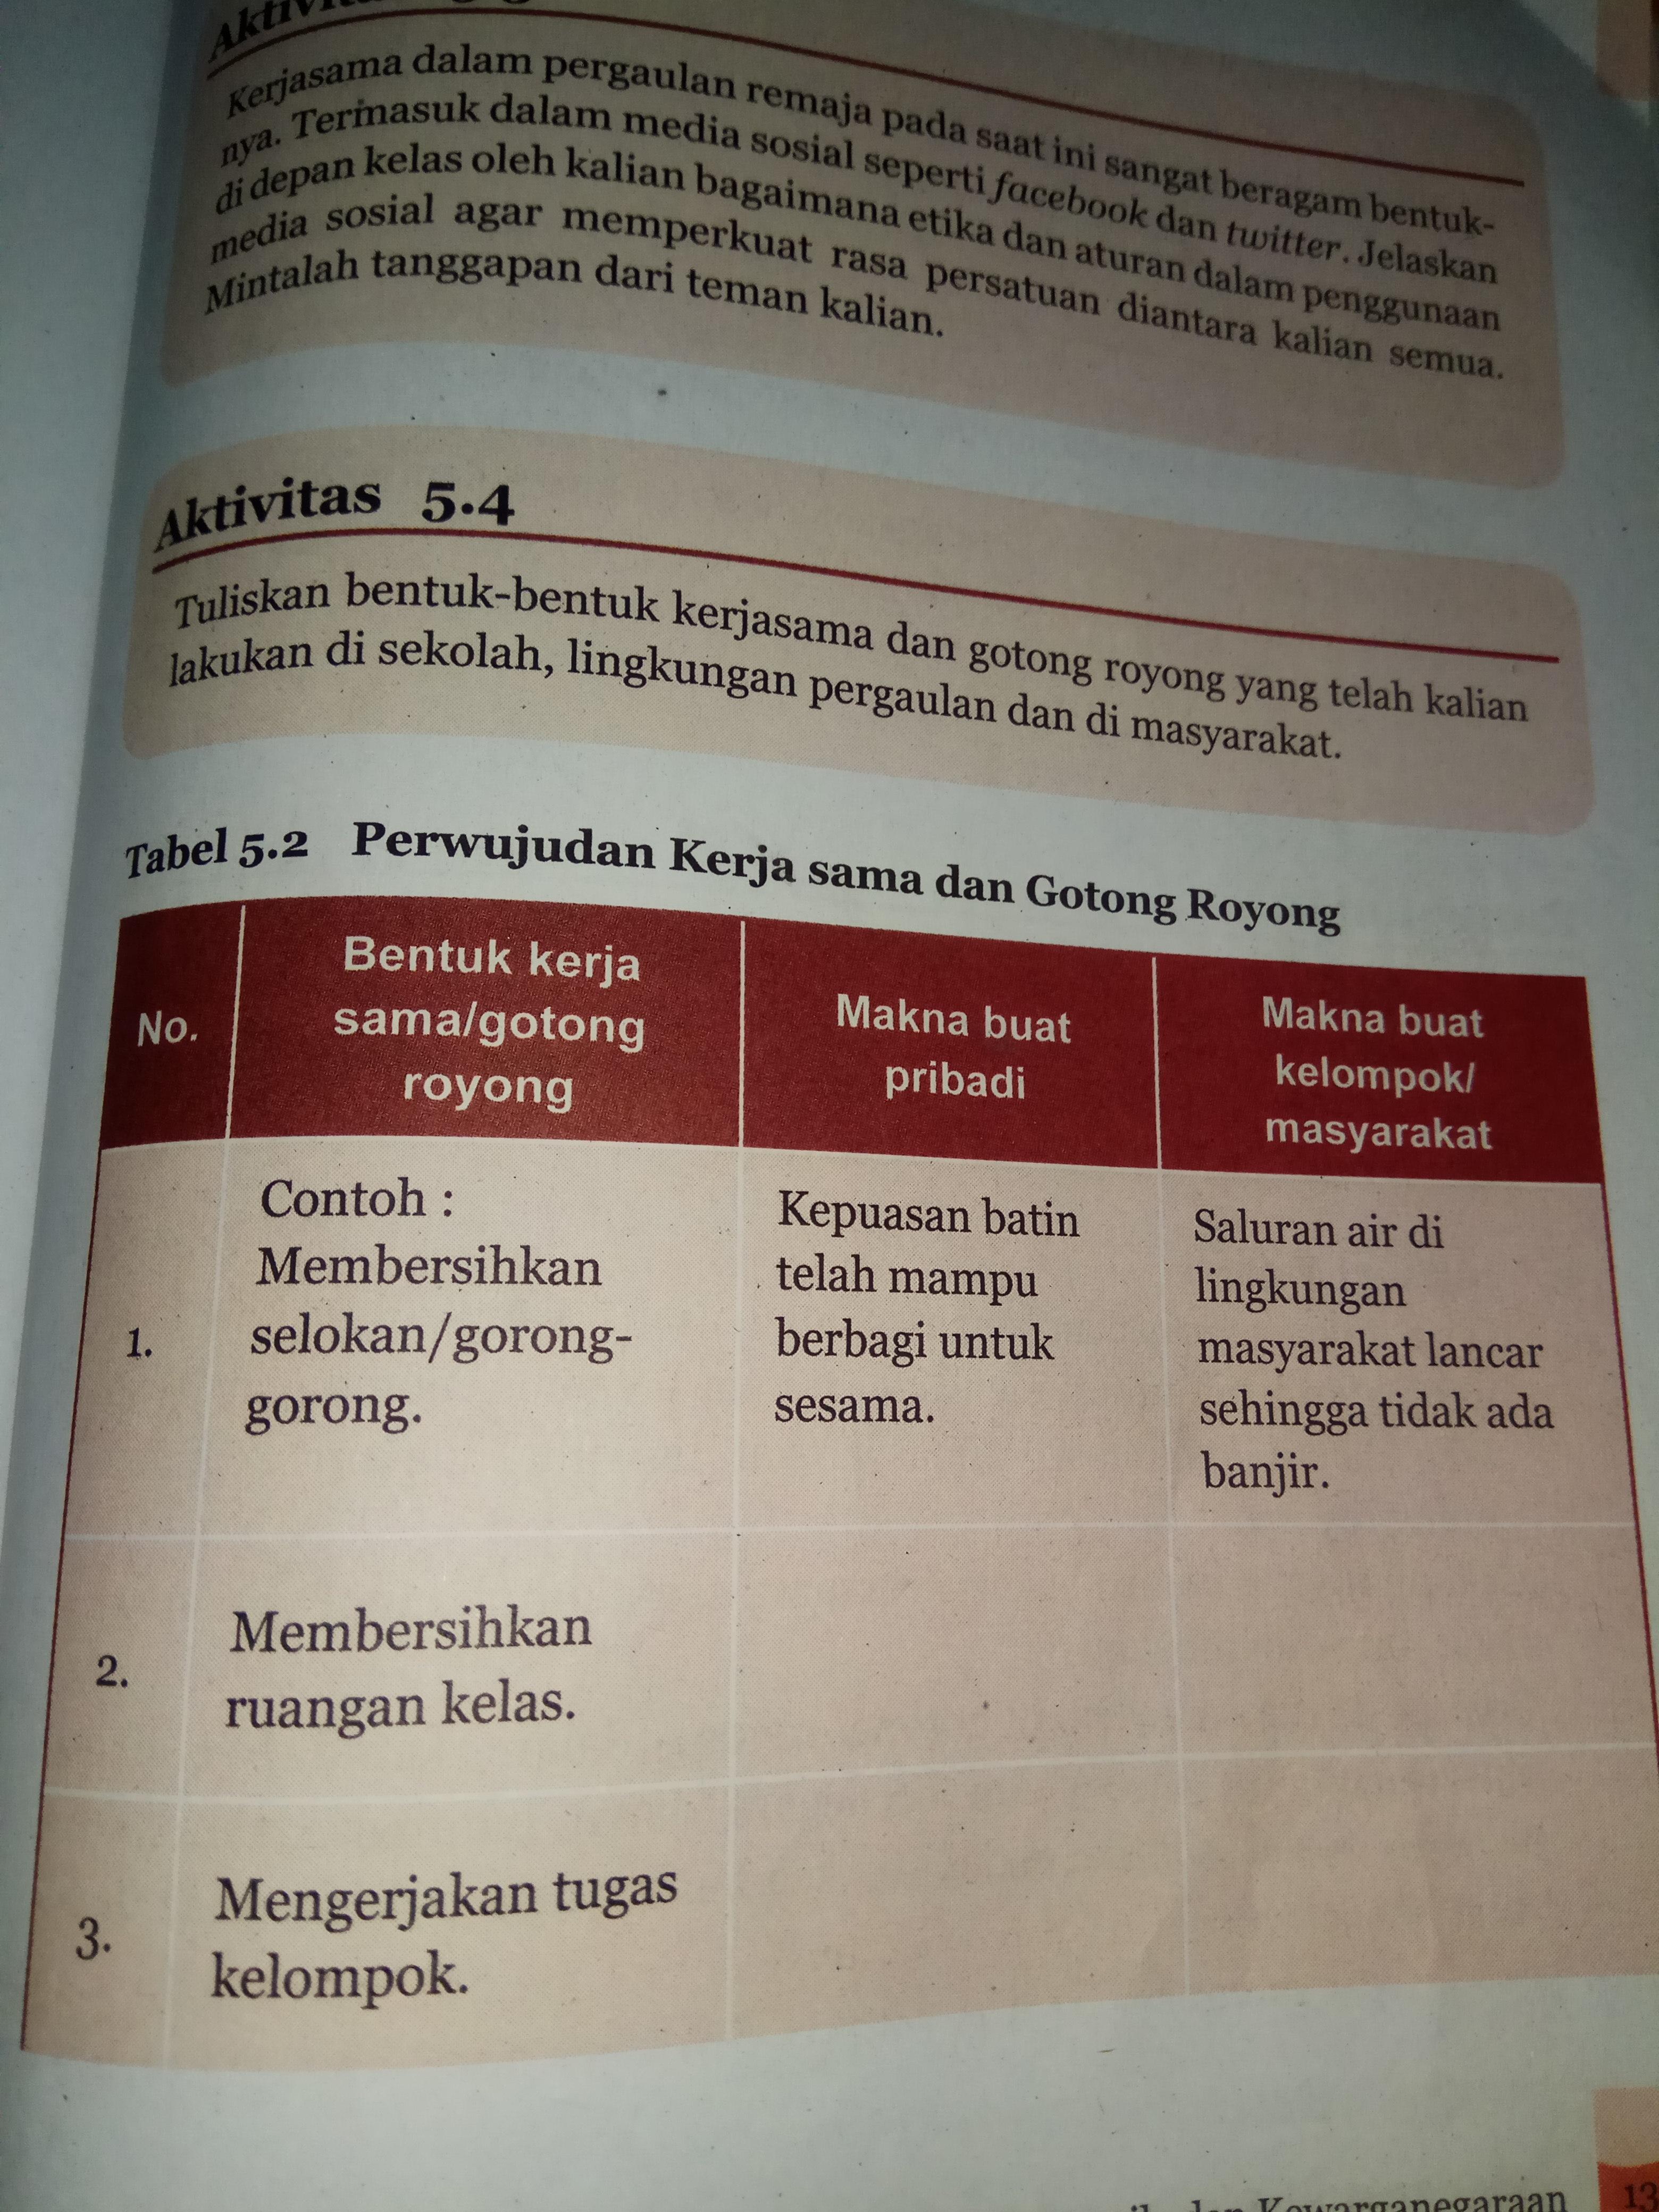 Kegiatan 6 halaman 63 ips kelas 8 brainly co id. Jawaban Tugas Individu Bahasa Indonesia Kelas 8 Halaman